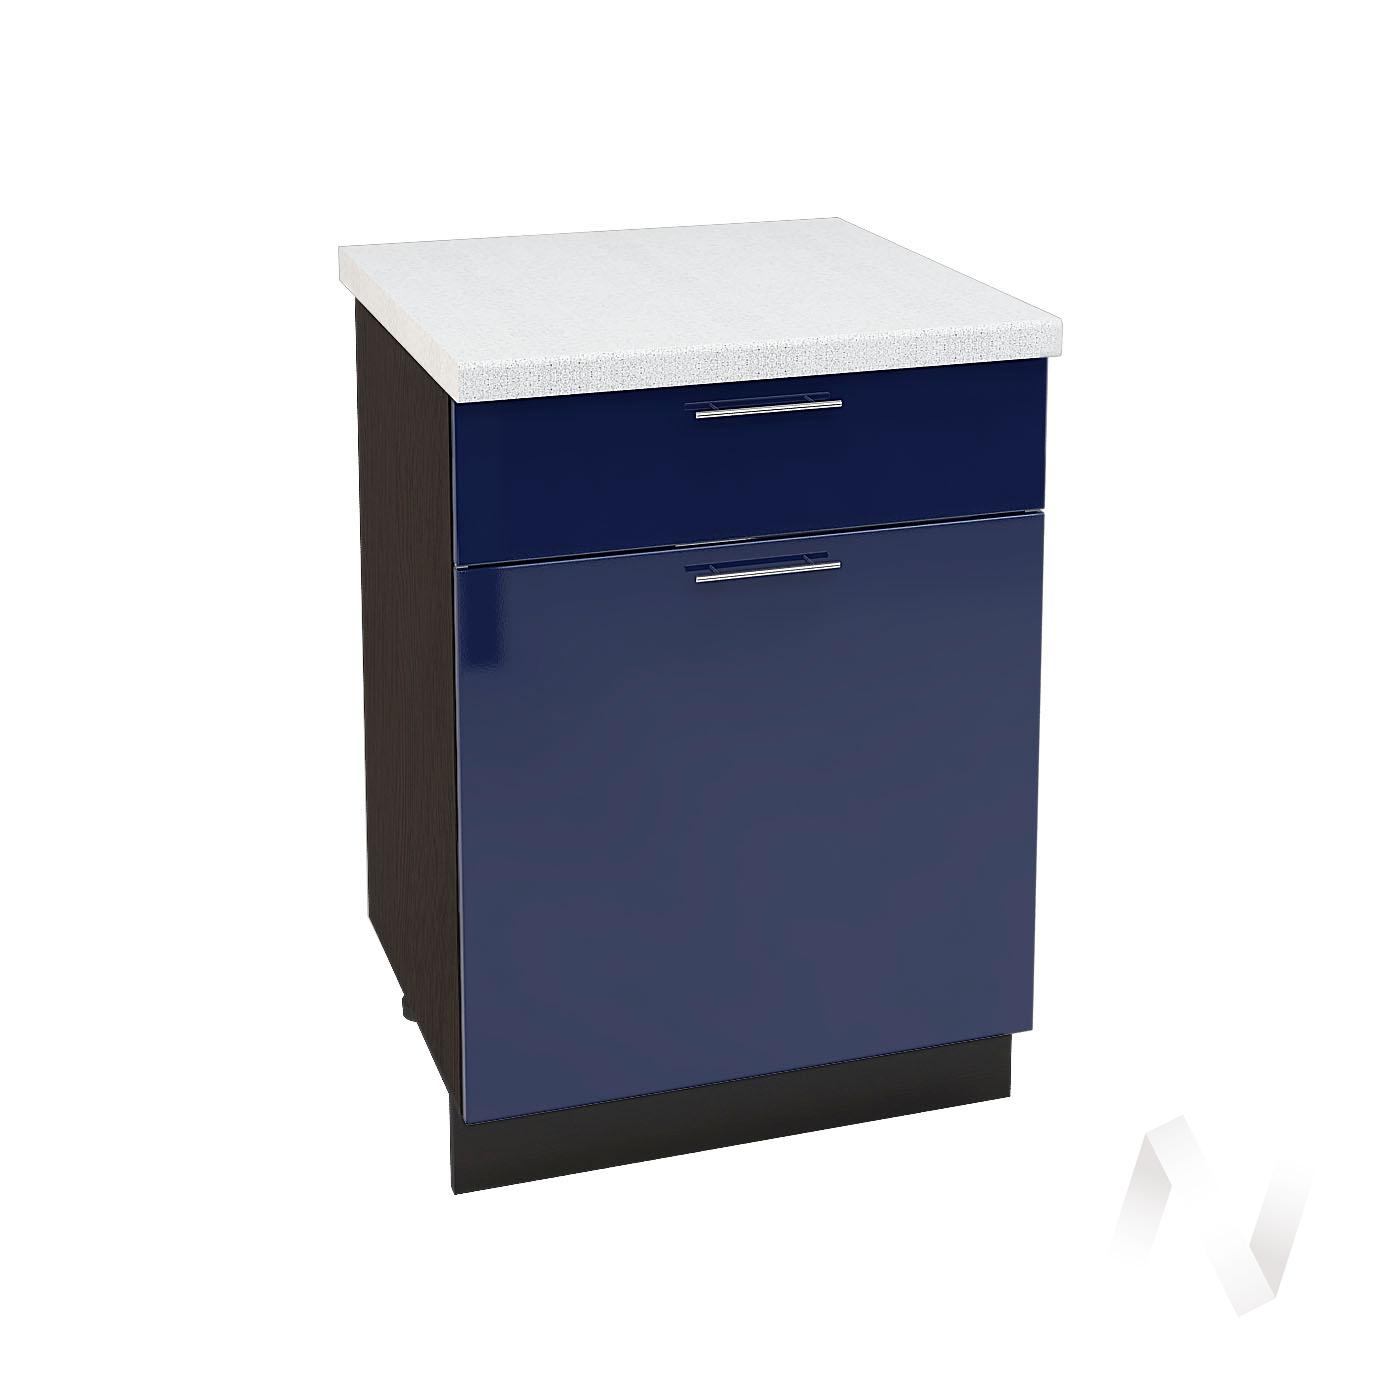 "Кухня ""Валерия-М"": Шкаф нижний с ящиком 600, ШН1Я 600 М (Синий глянец/корпус венге)"